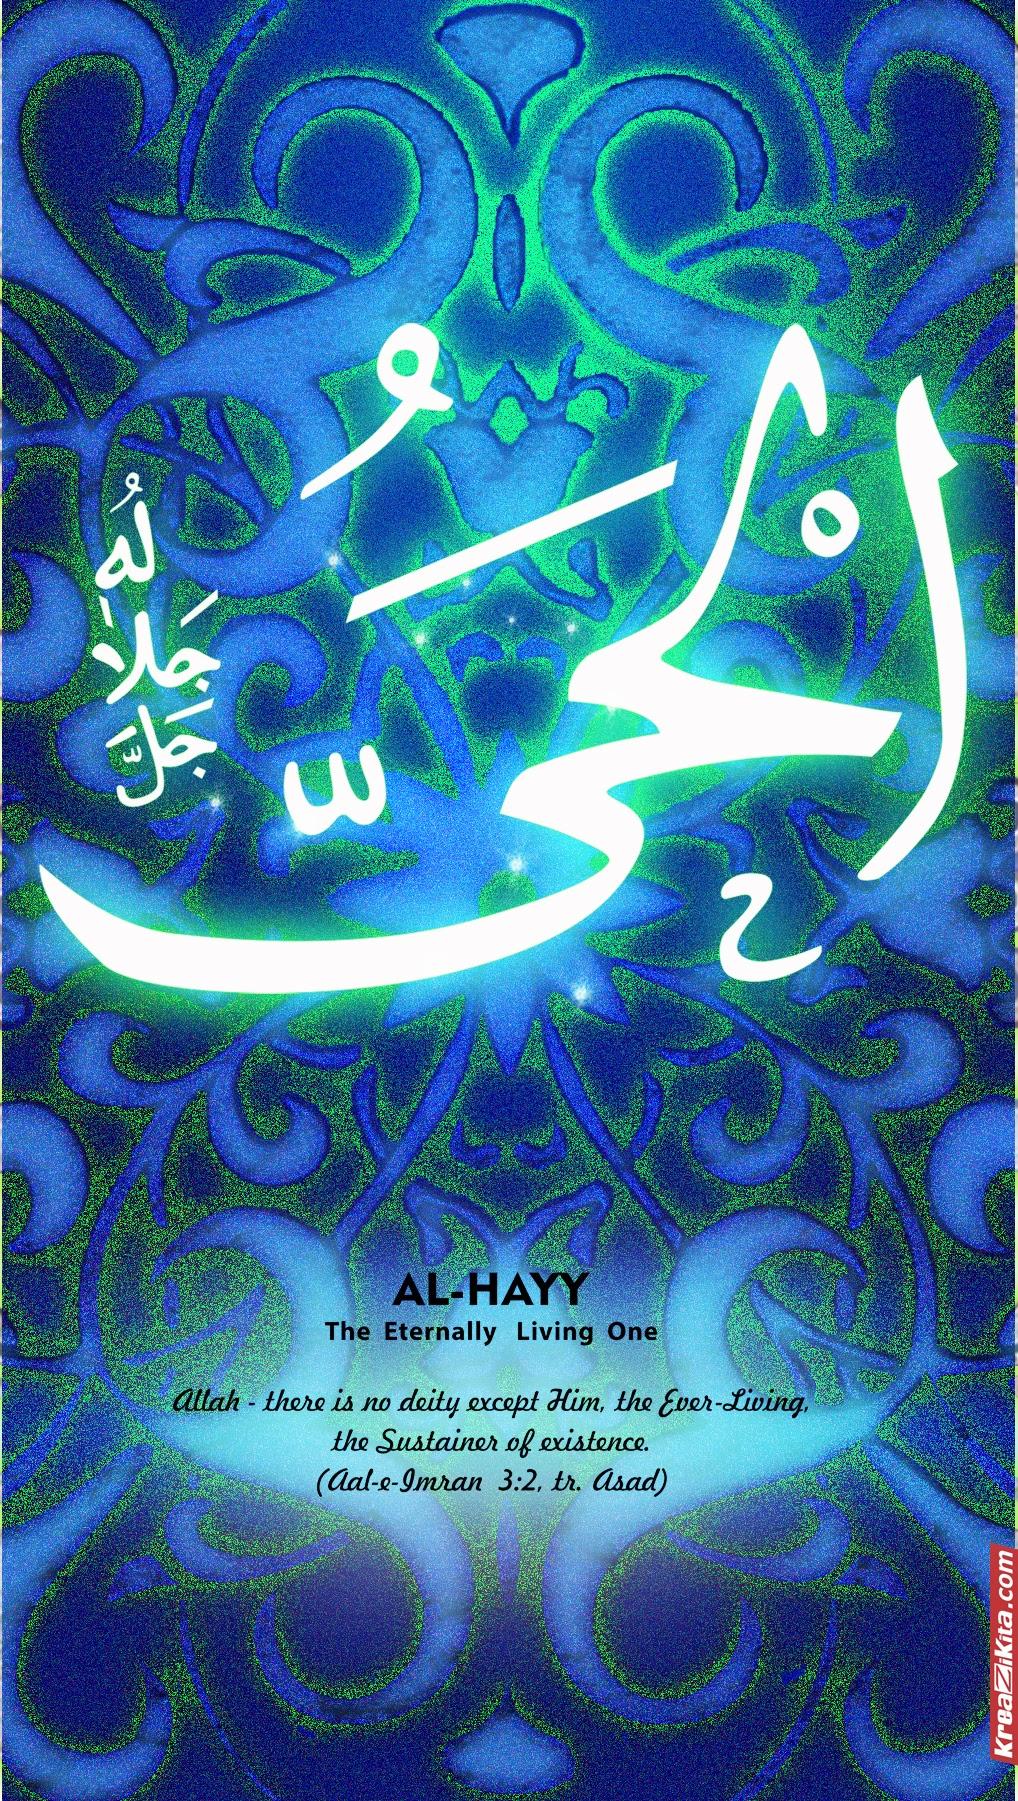 Kaligrafi Asmaul Husna Dan Artinya : kaligrafi, asmaul, husna, artinya, Wallpaper, Design, ASMAUL, HUSNA